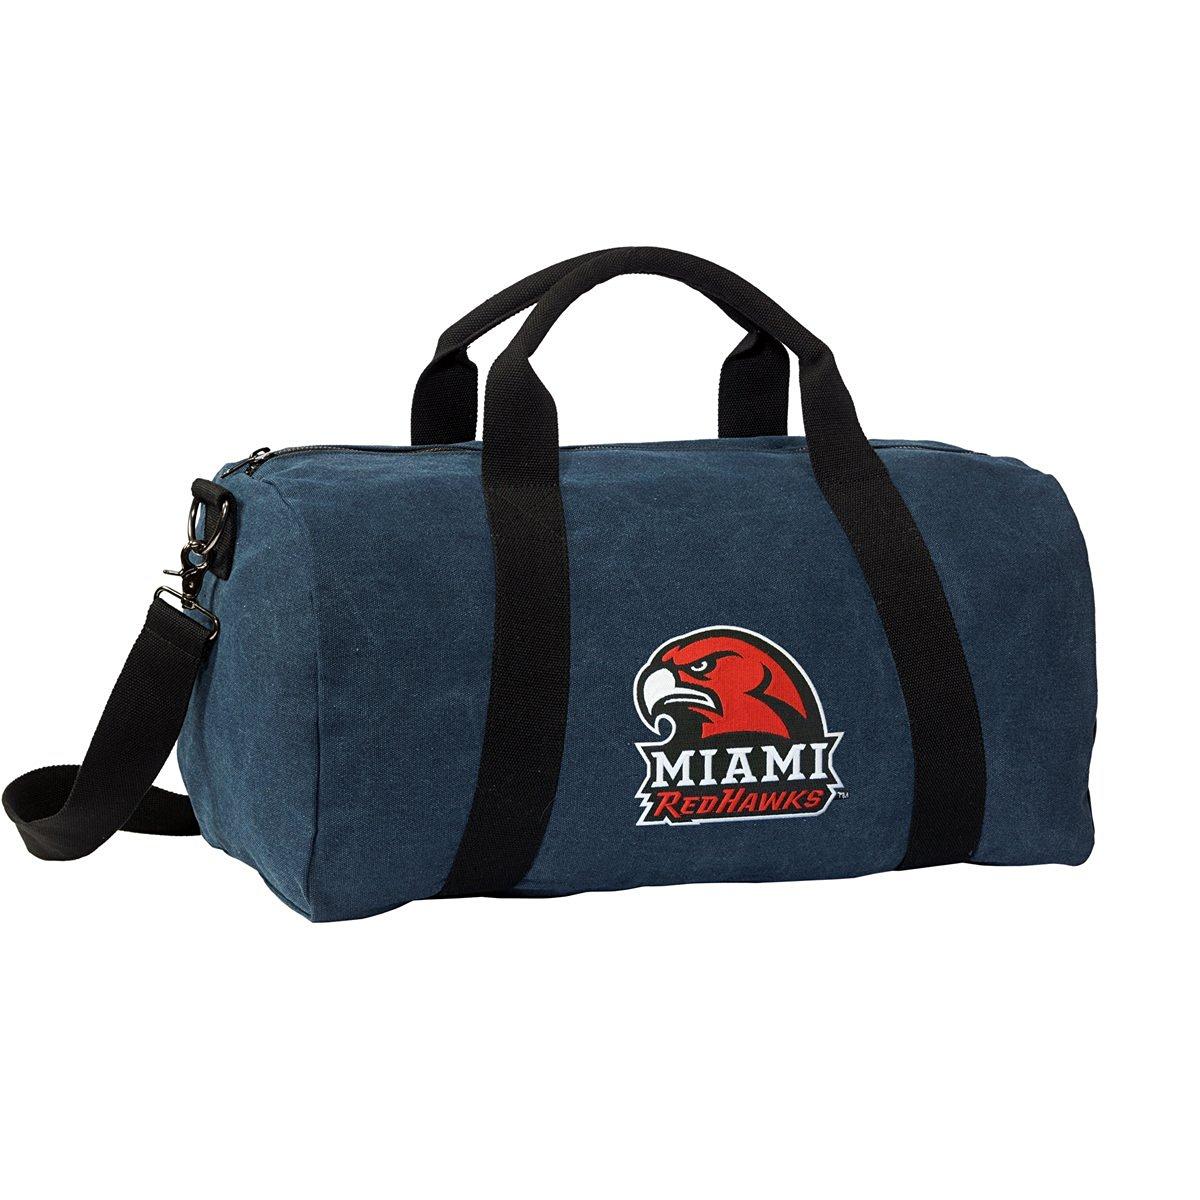 Miami University Duffel Bags - Unique Miami RedHawks Gym Bags